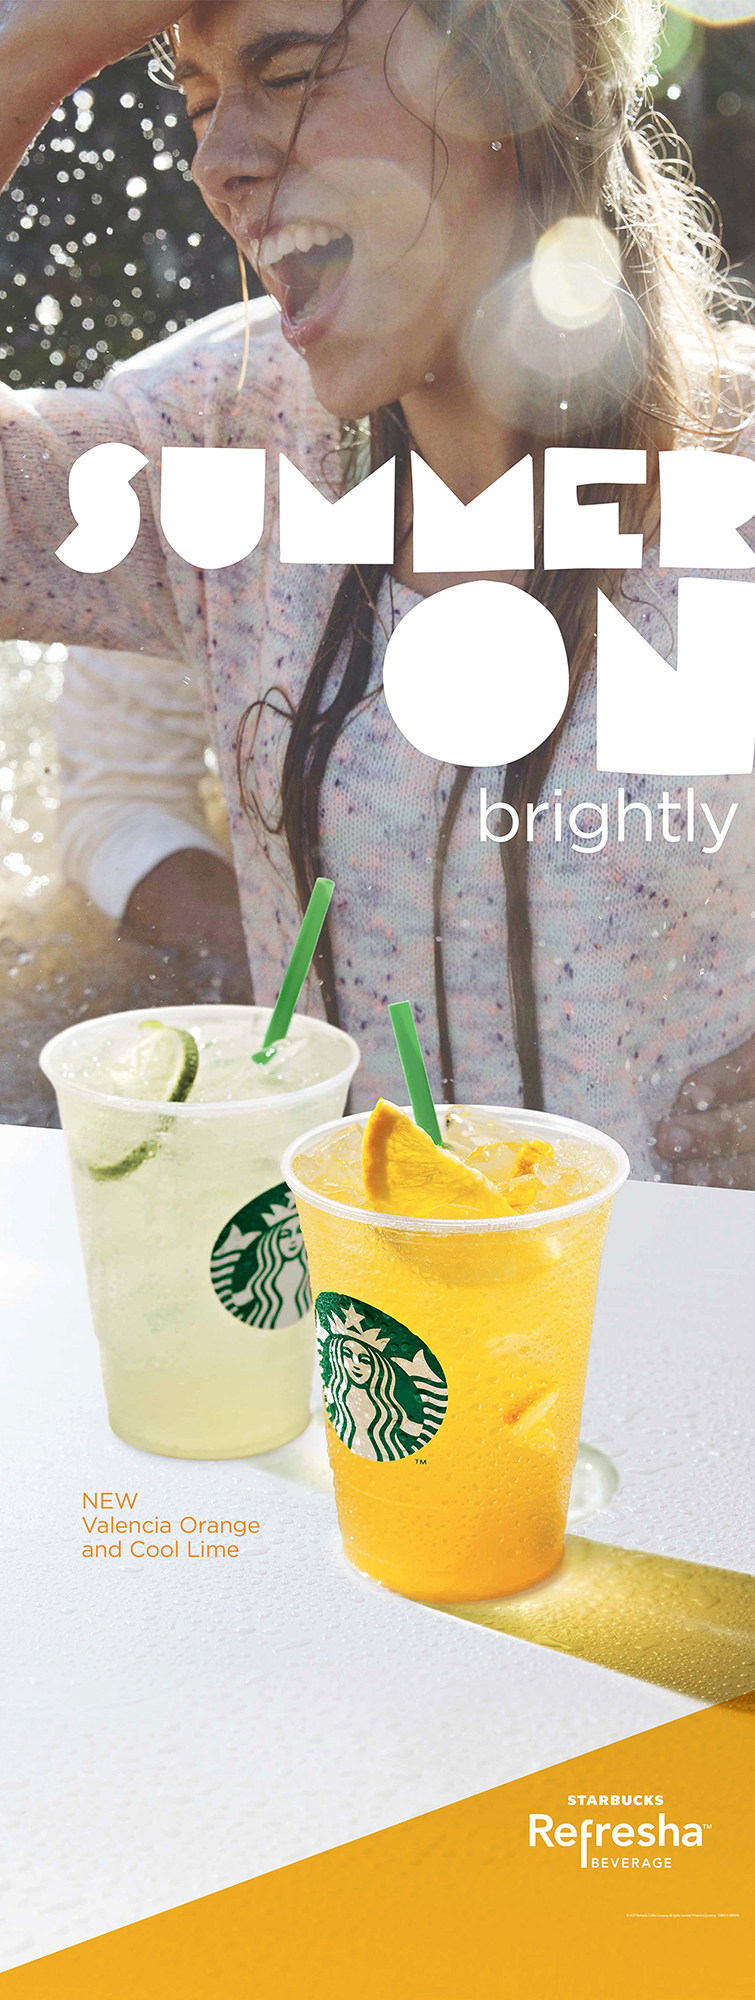 Starbucks Bryan Sheffield